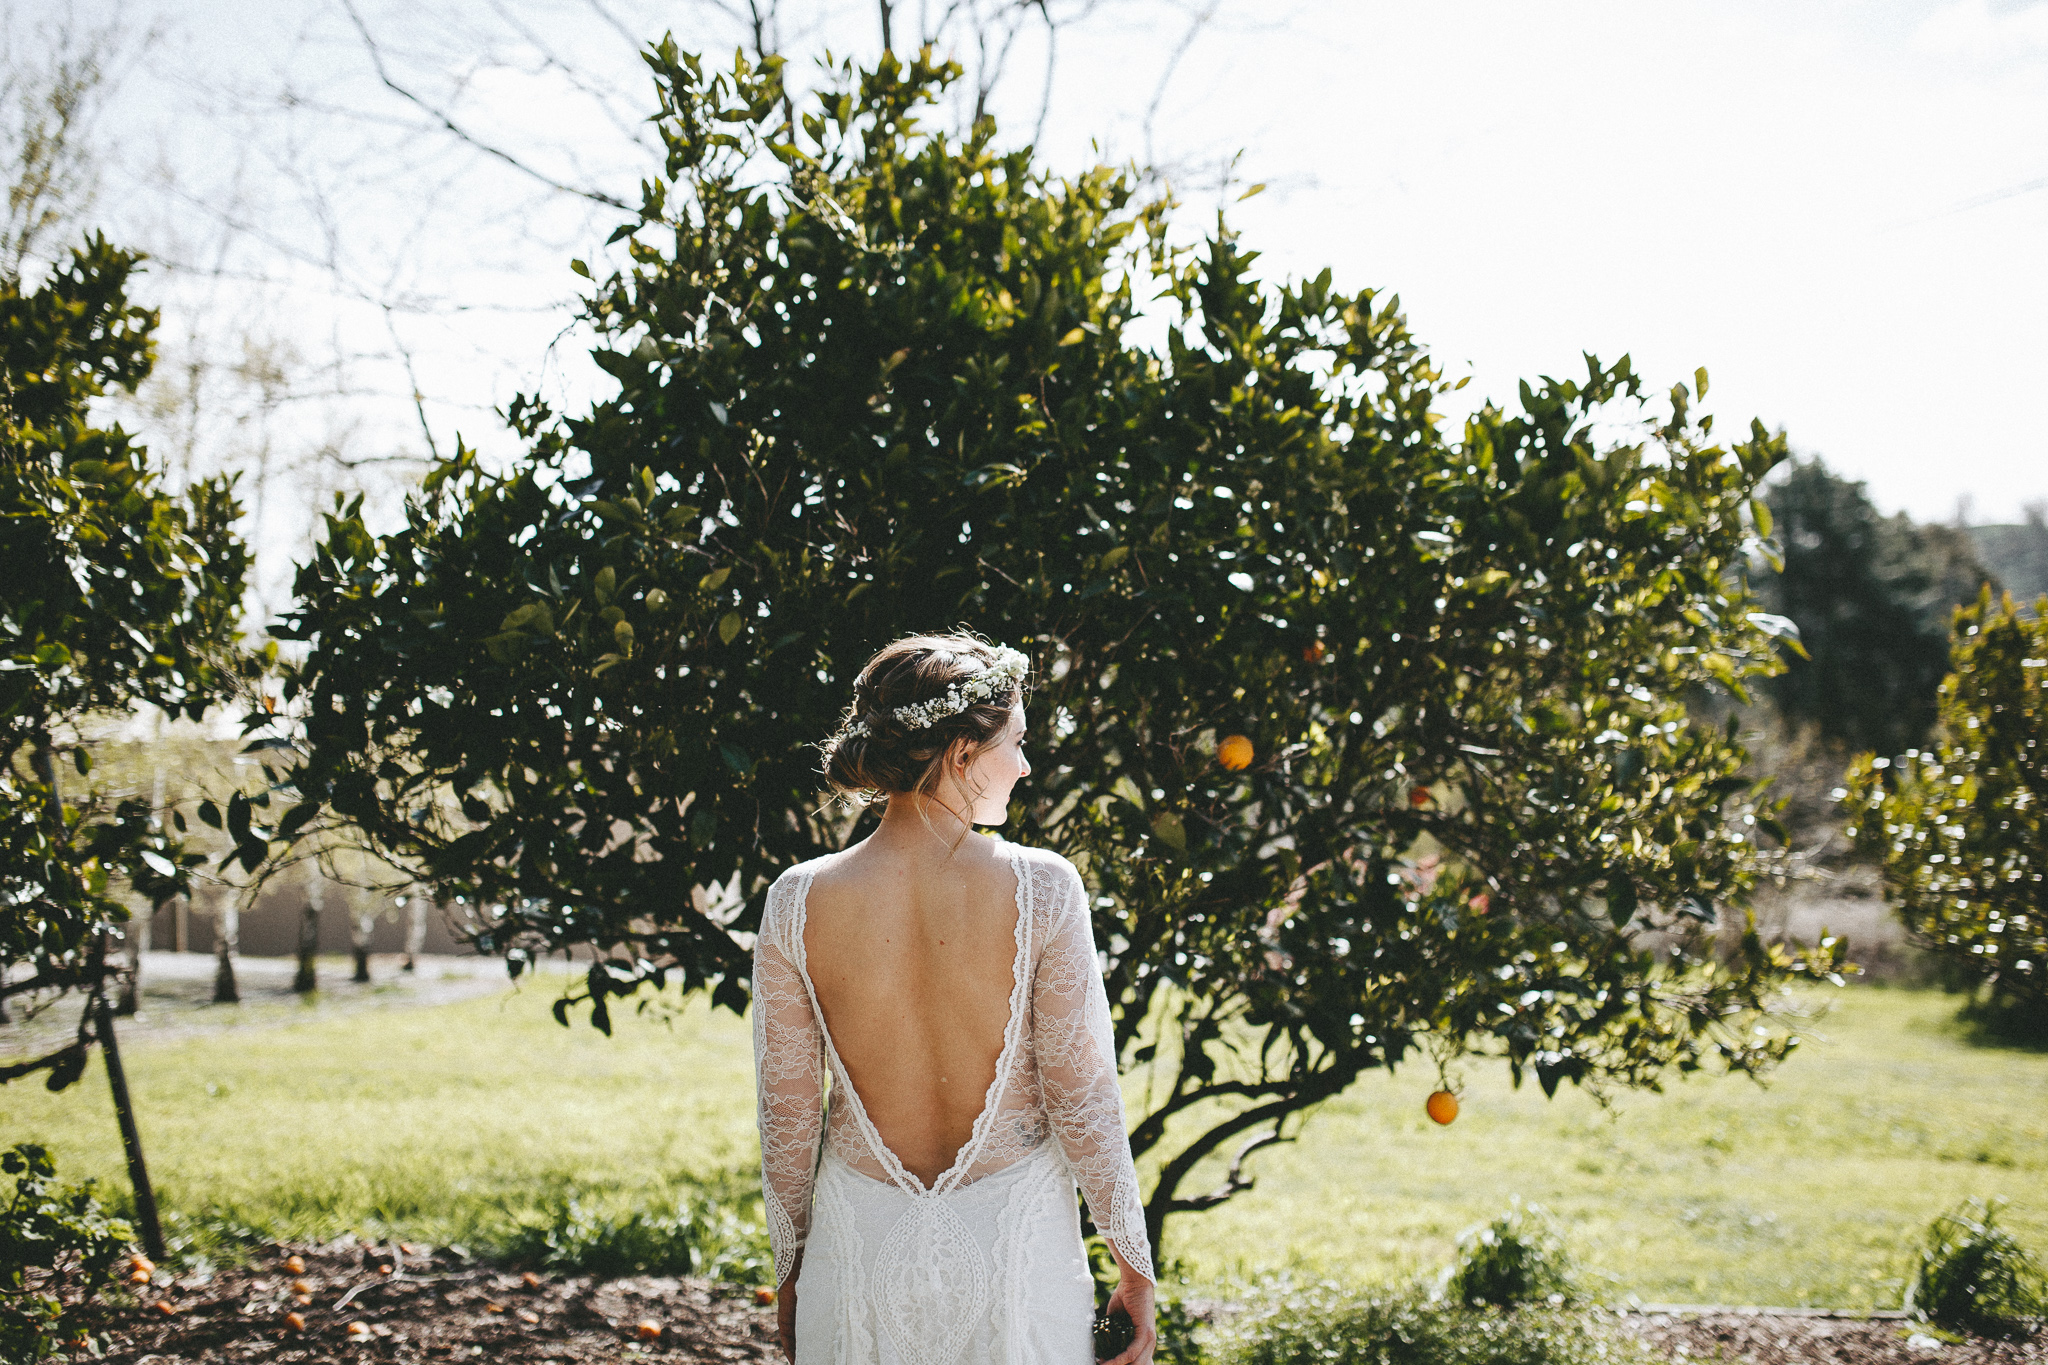 christopher morrison_adelaide hills wedding_ andy + teegan_30_9654.jpg